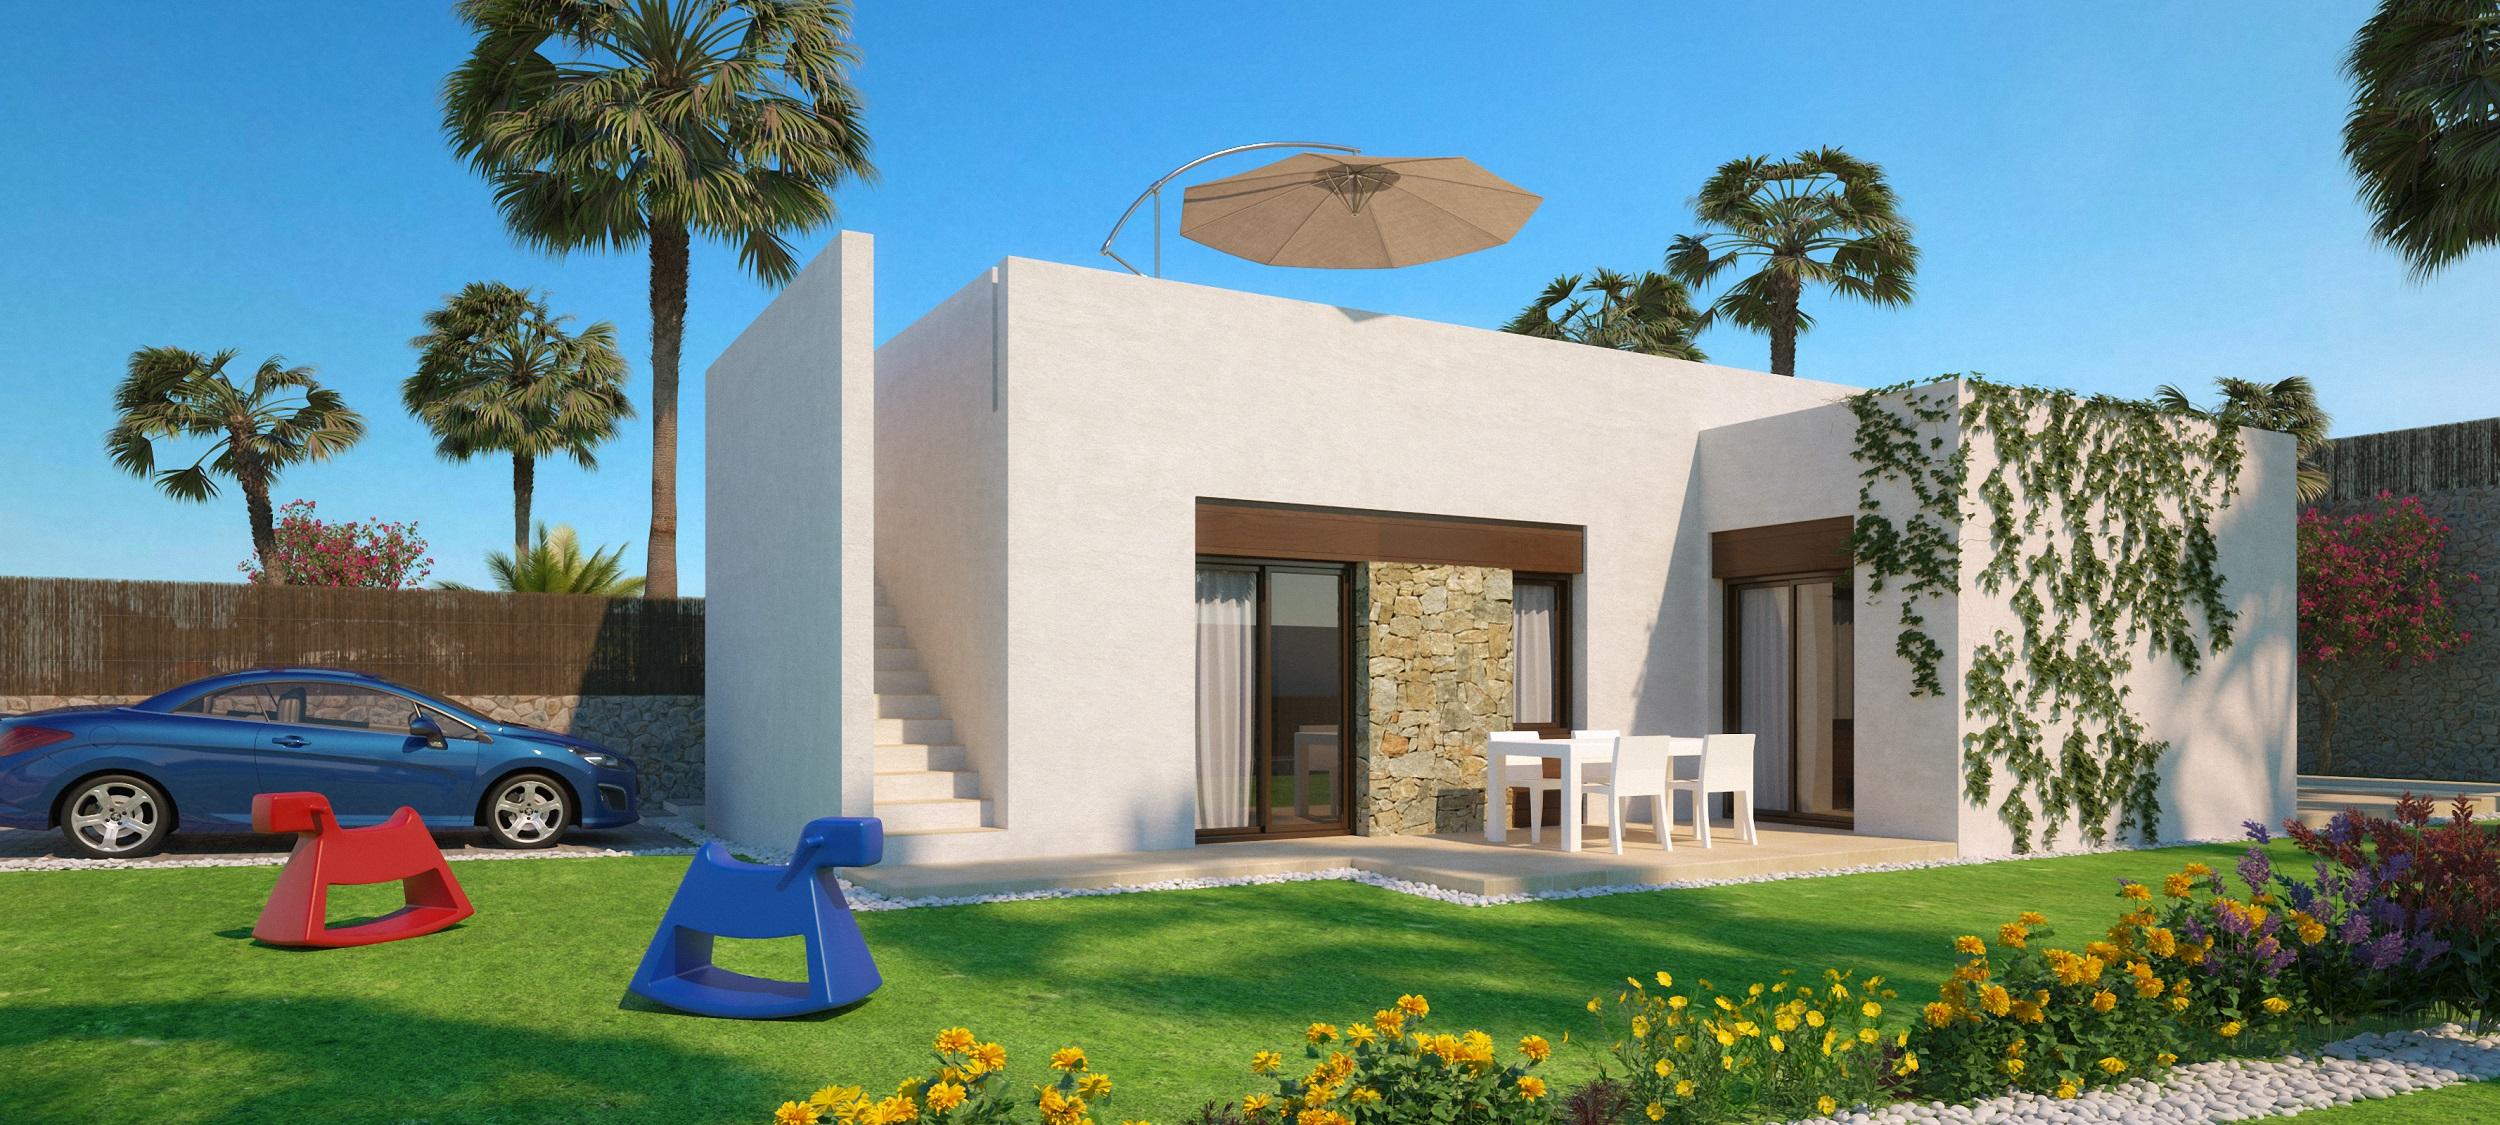 Villa moderne espagne costa blanca clickforthesun for Villa moderne 2016